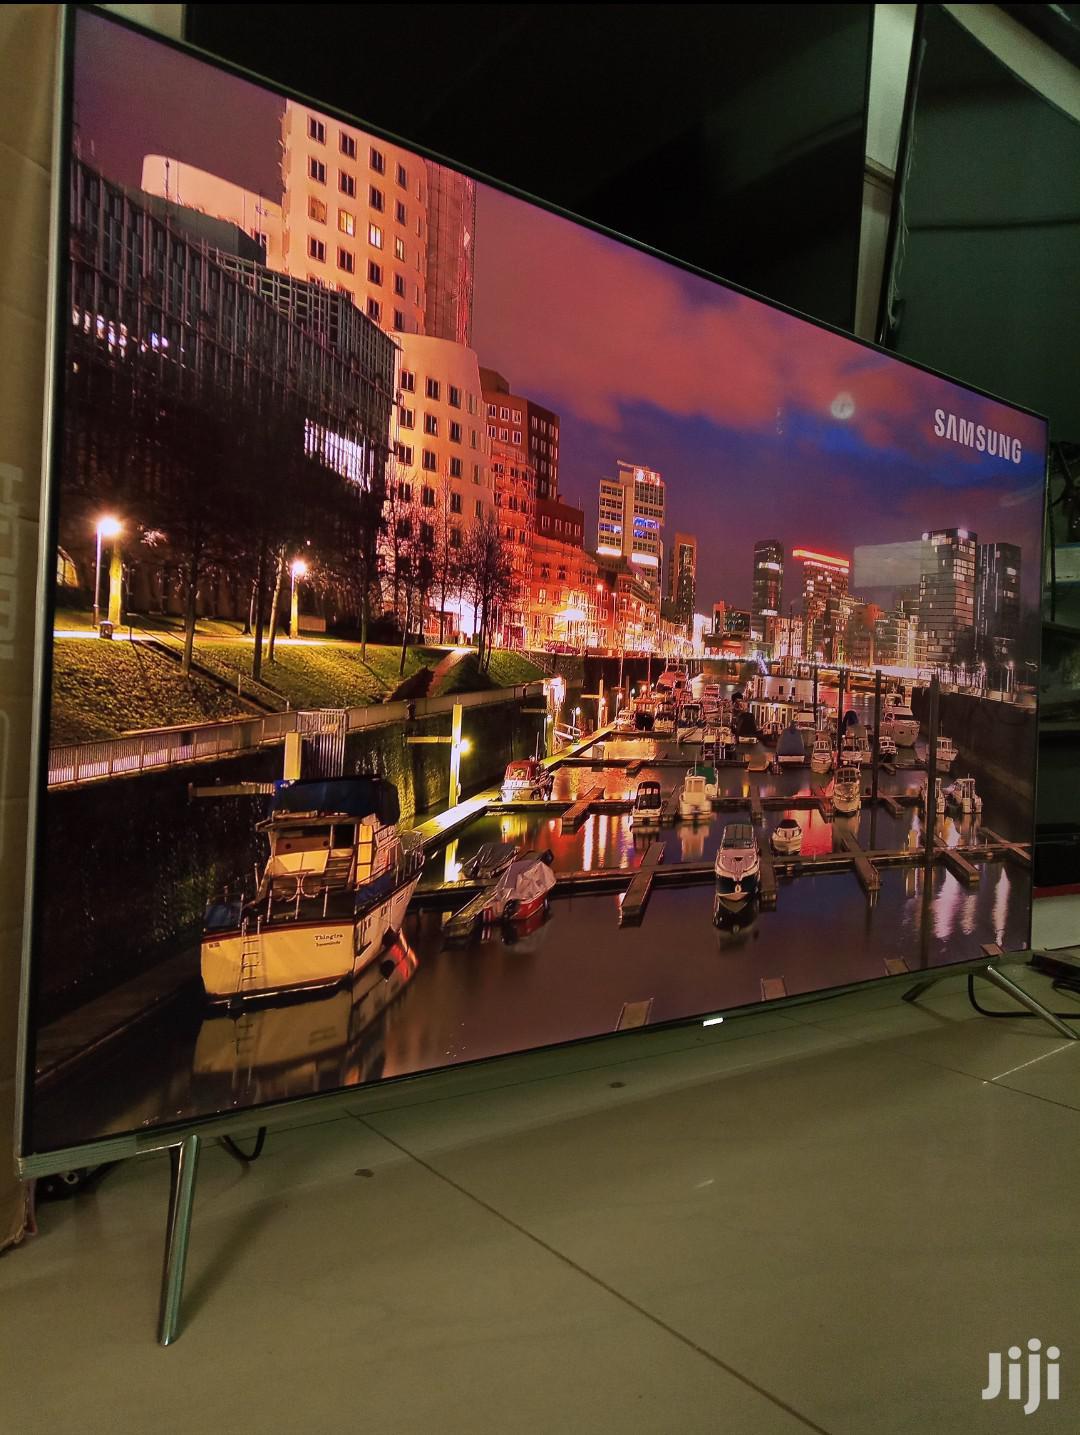 Samsung 55inches Series 9 QLED Tvs | TV & DVD Equipment for sale in Kampala, Central Region, Uganda